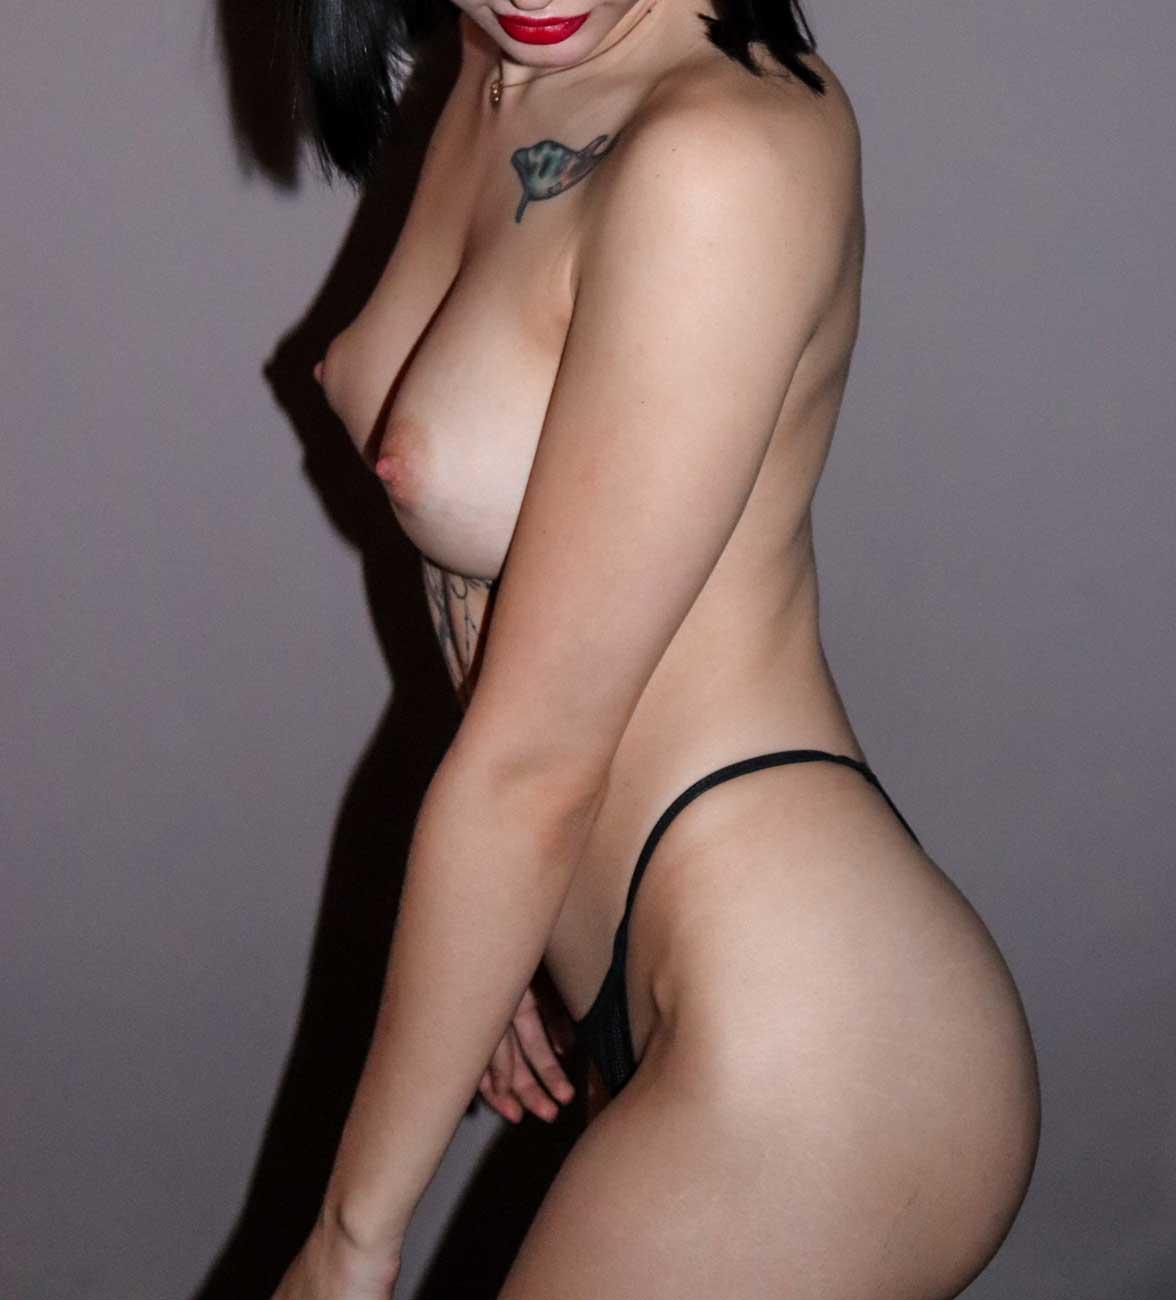 Jessica erotic masseuse